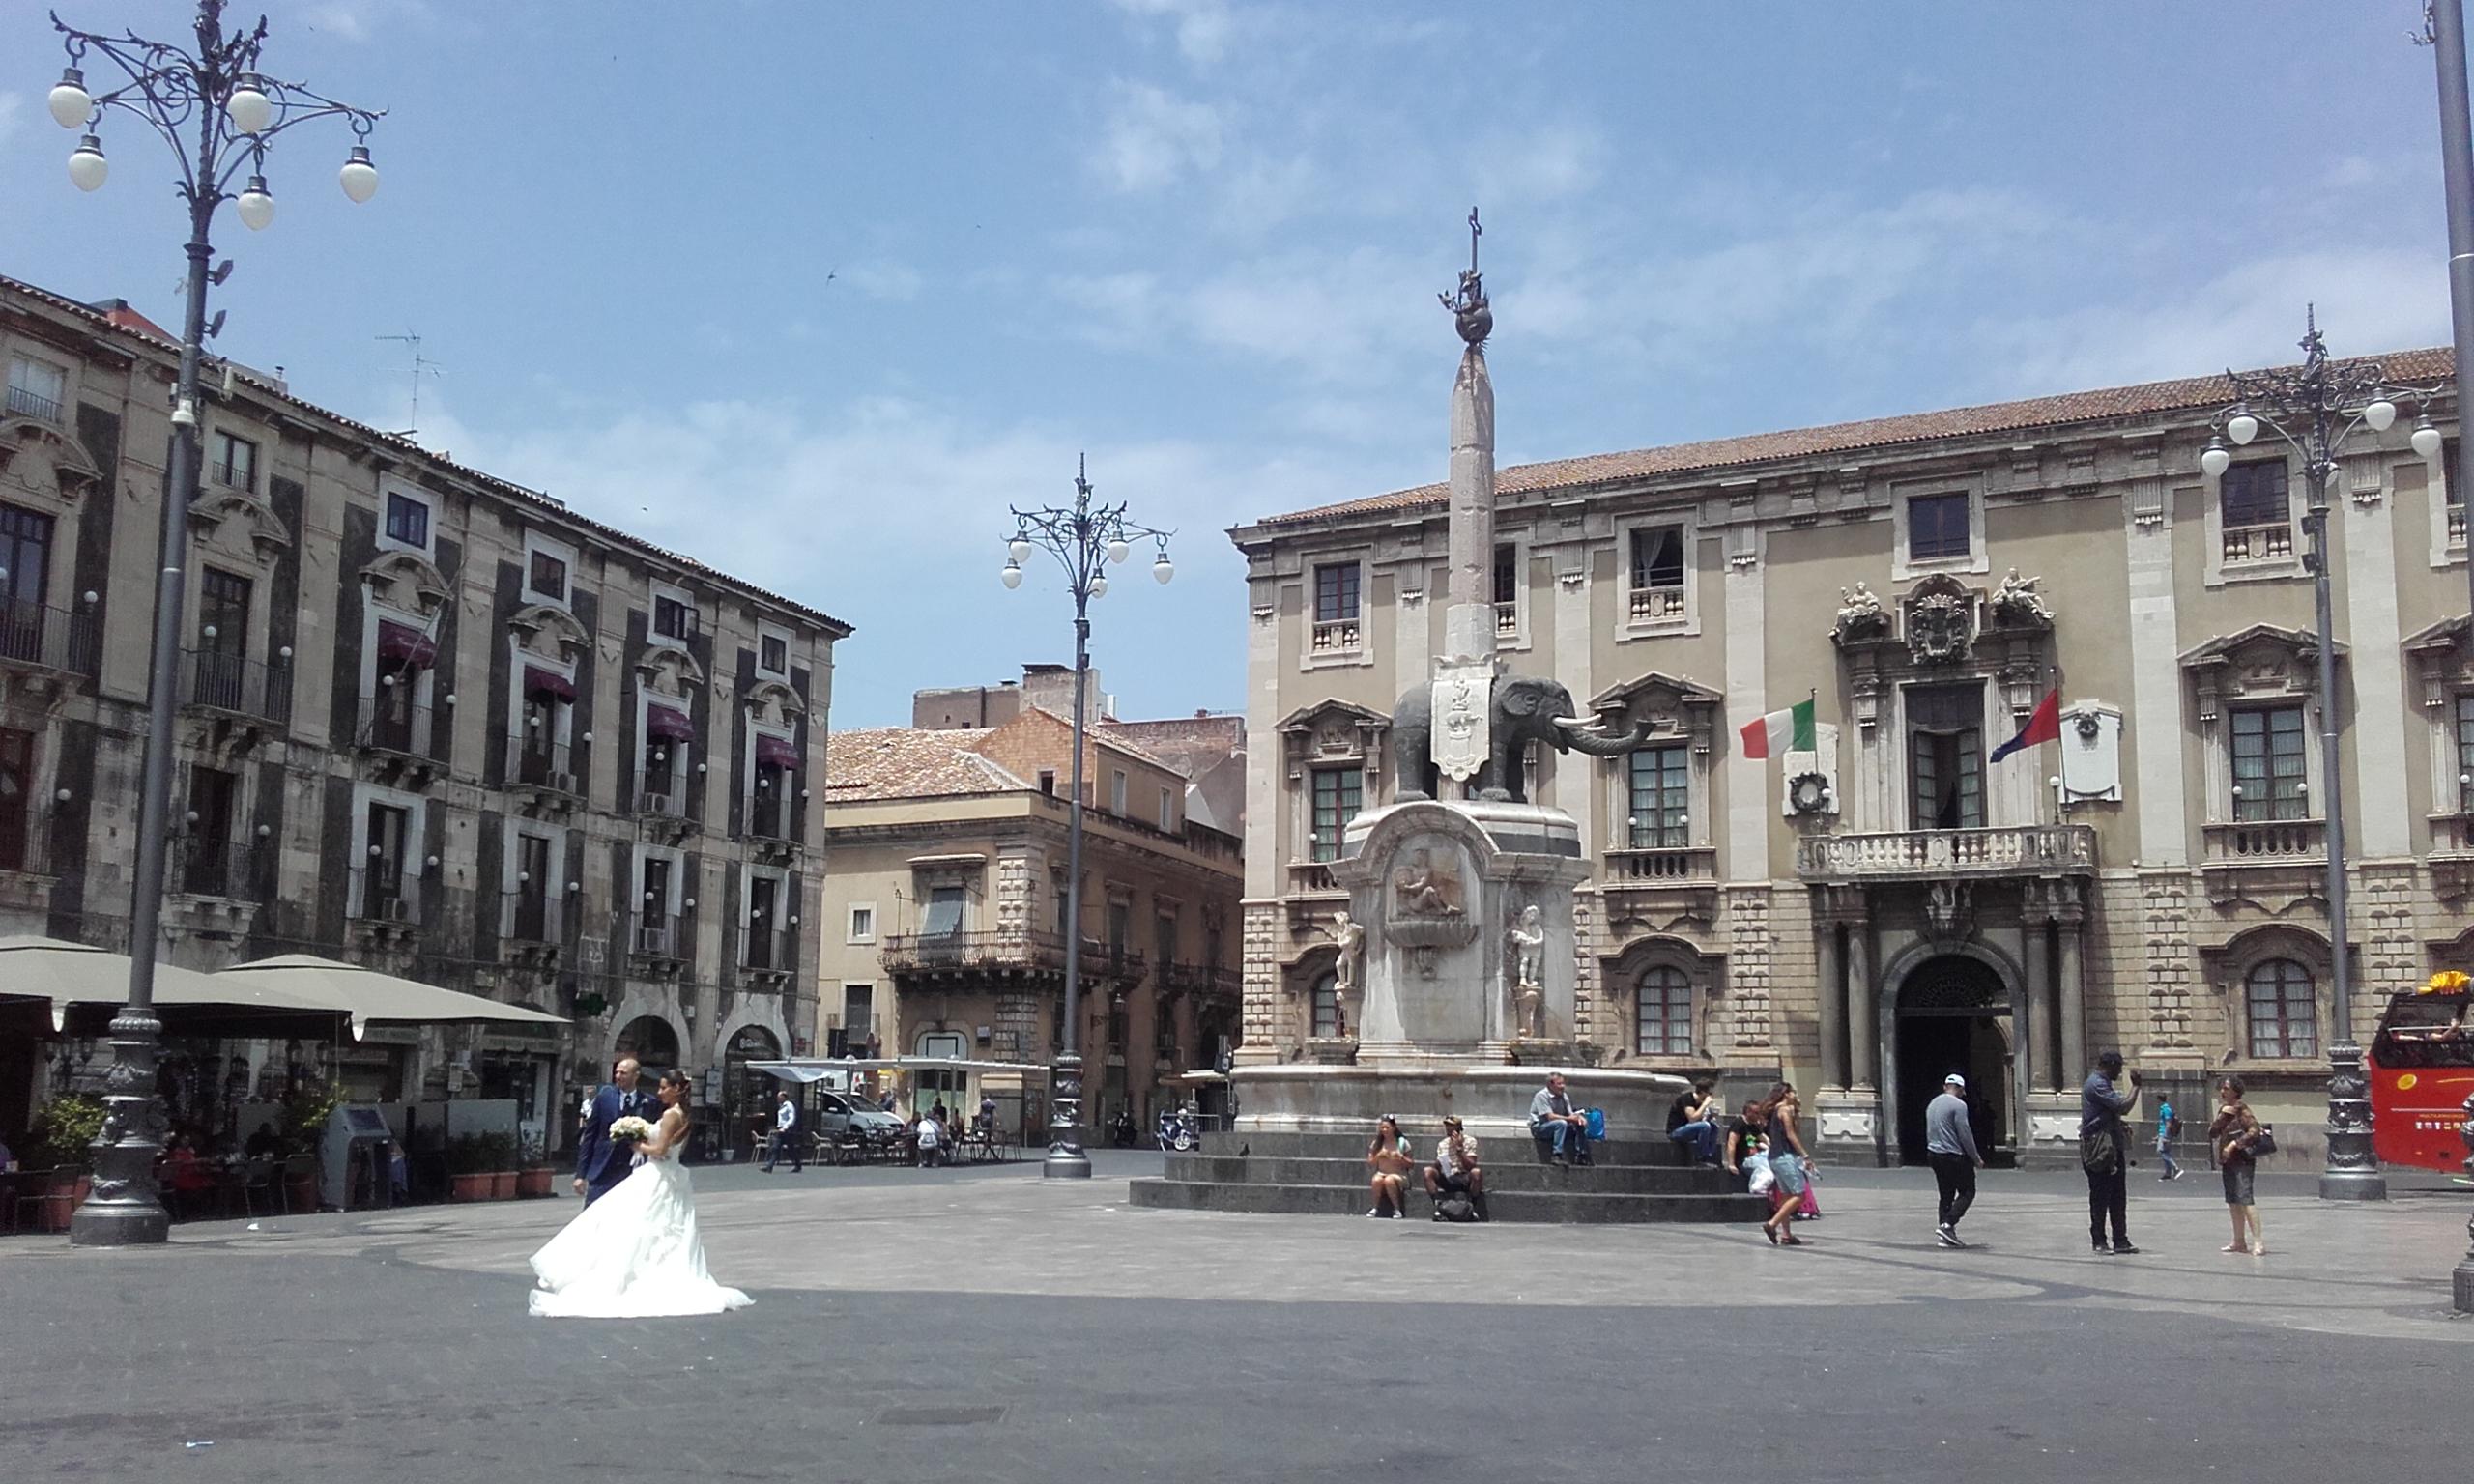 Sesión de fotos de boda enfrente de la Fontana dell'Elefante